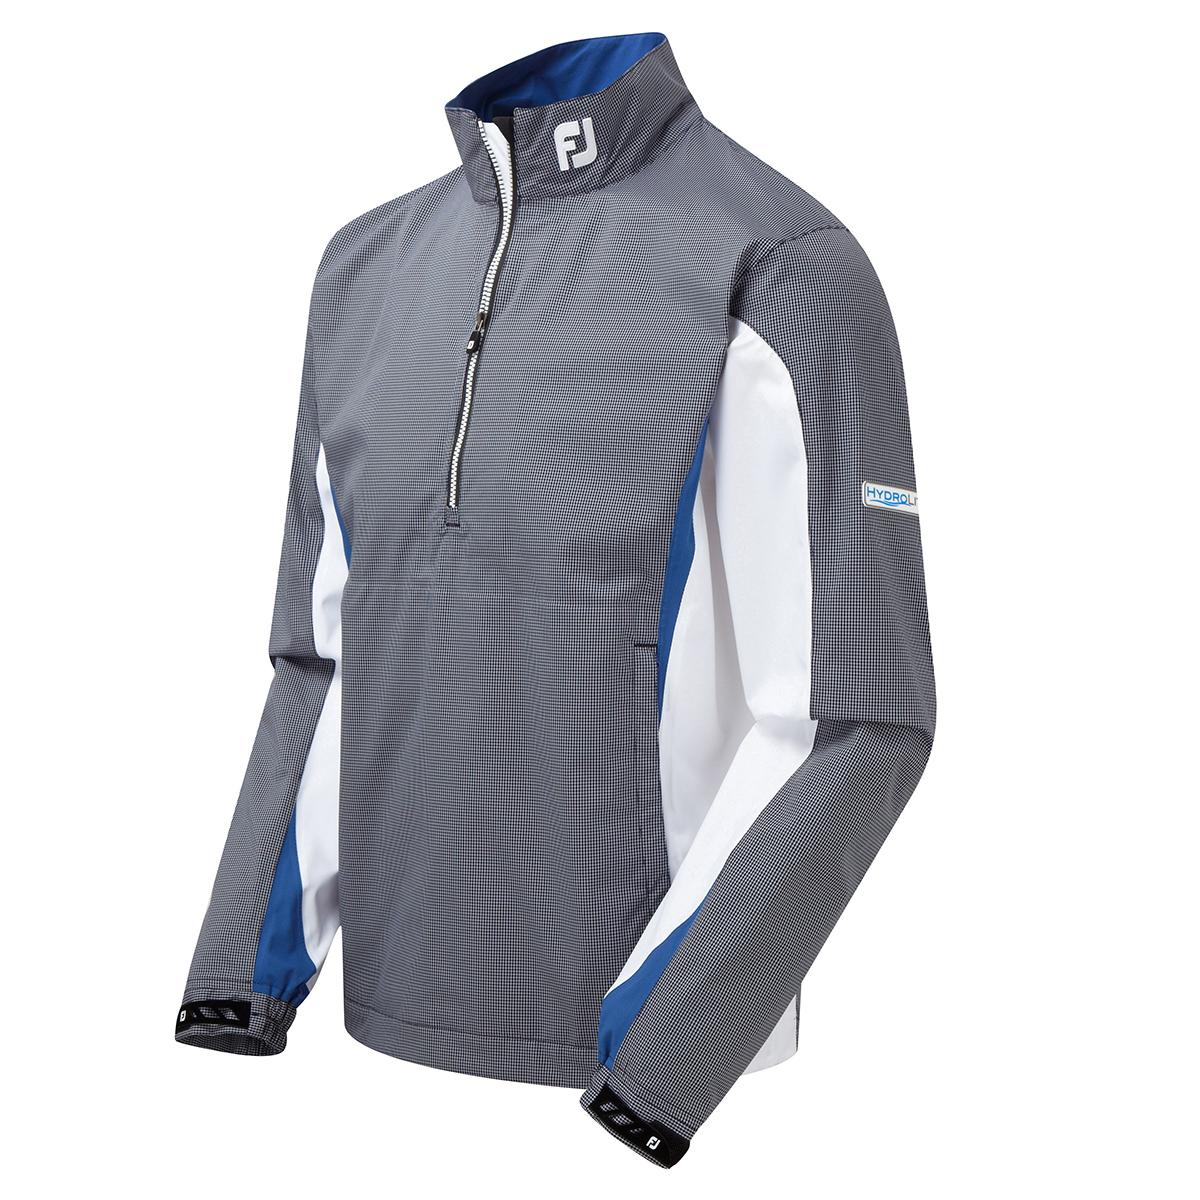 Footjoy Hydrolite Half Zip Rain Jacket From American Golf